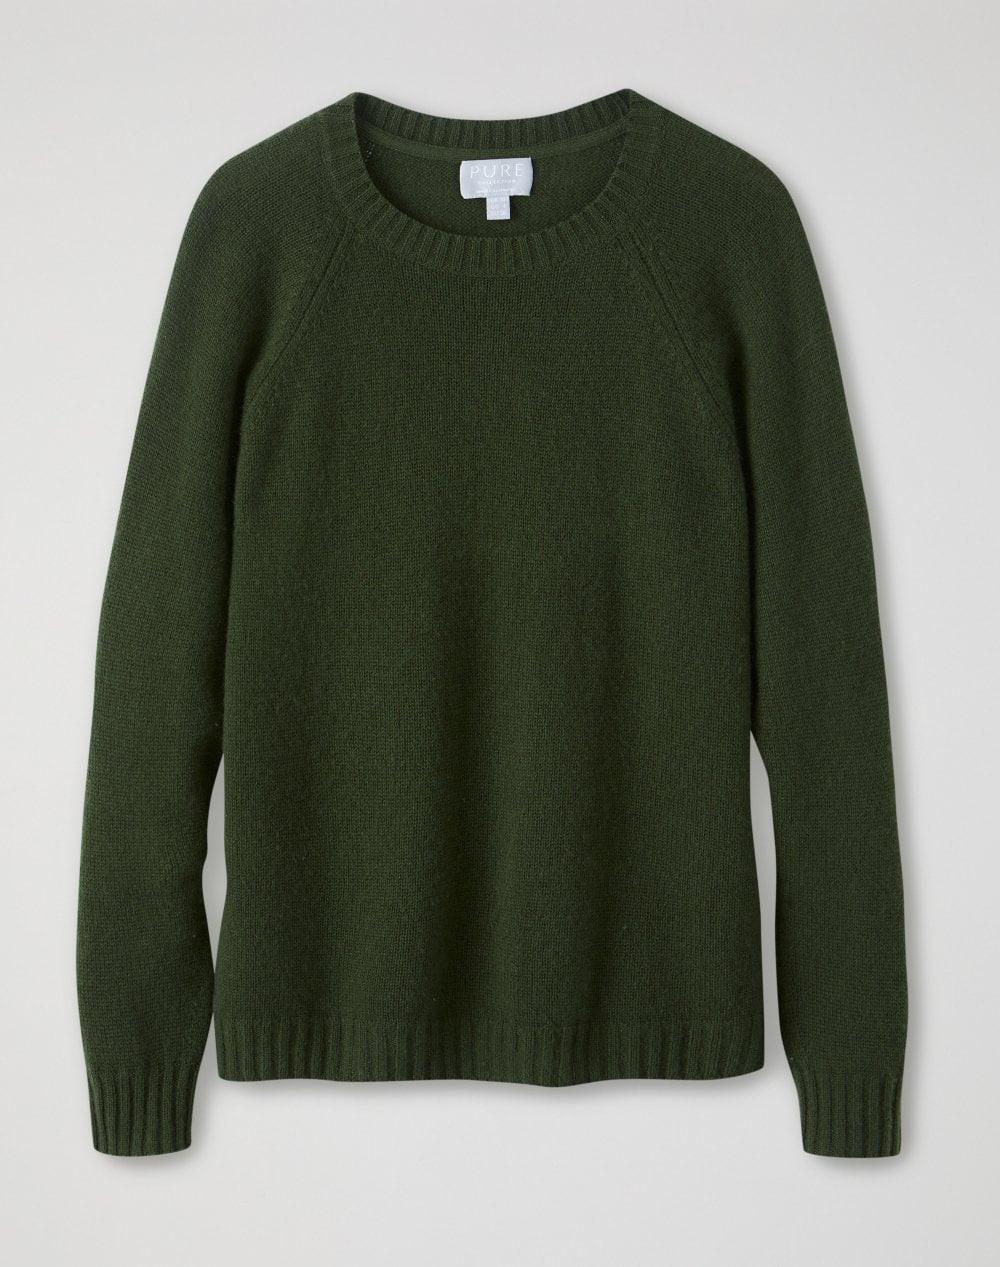 Pure collection khaki lofty jumper